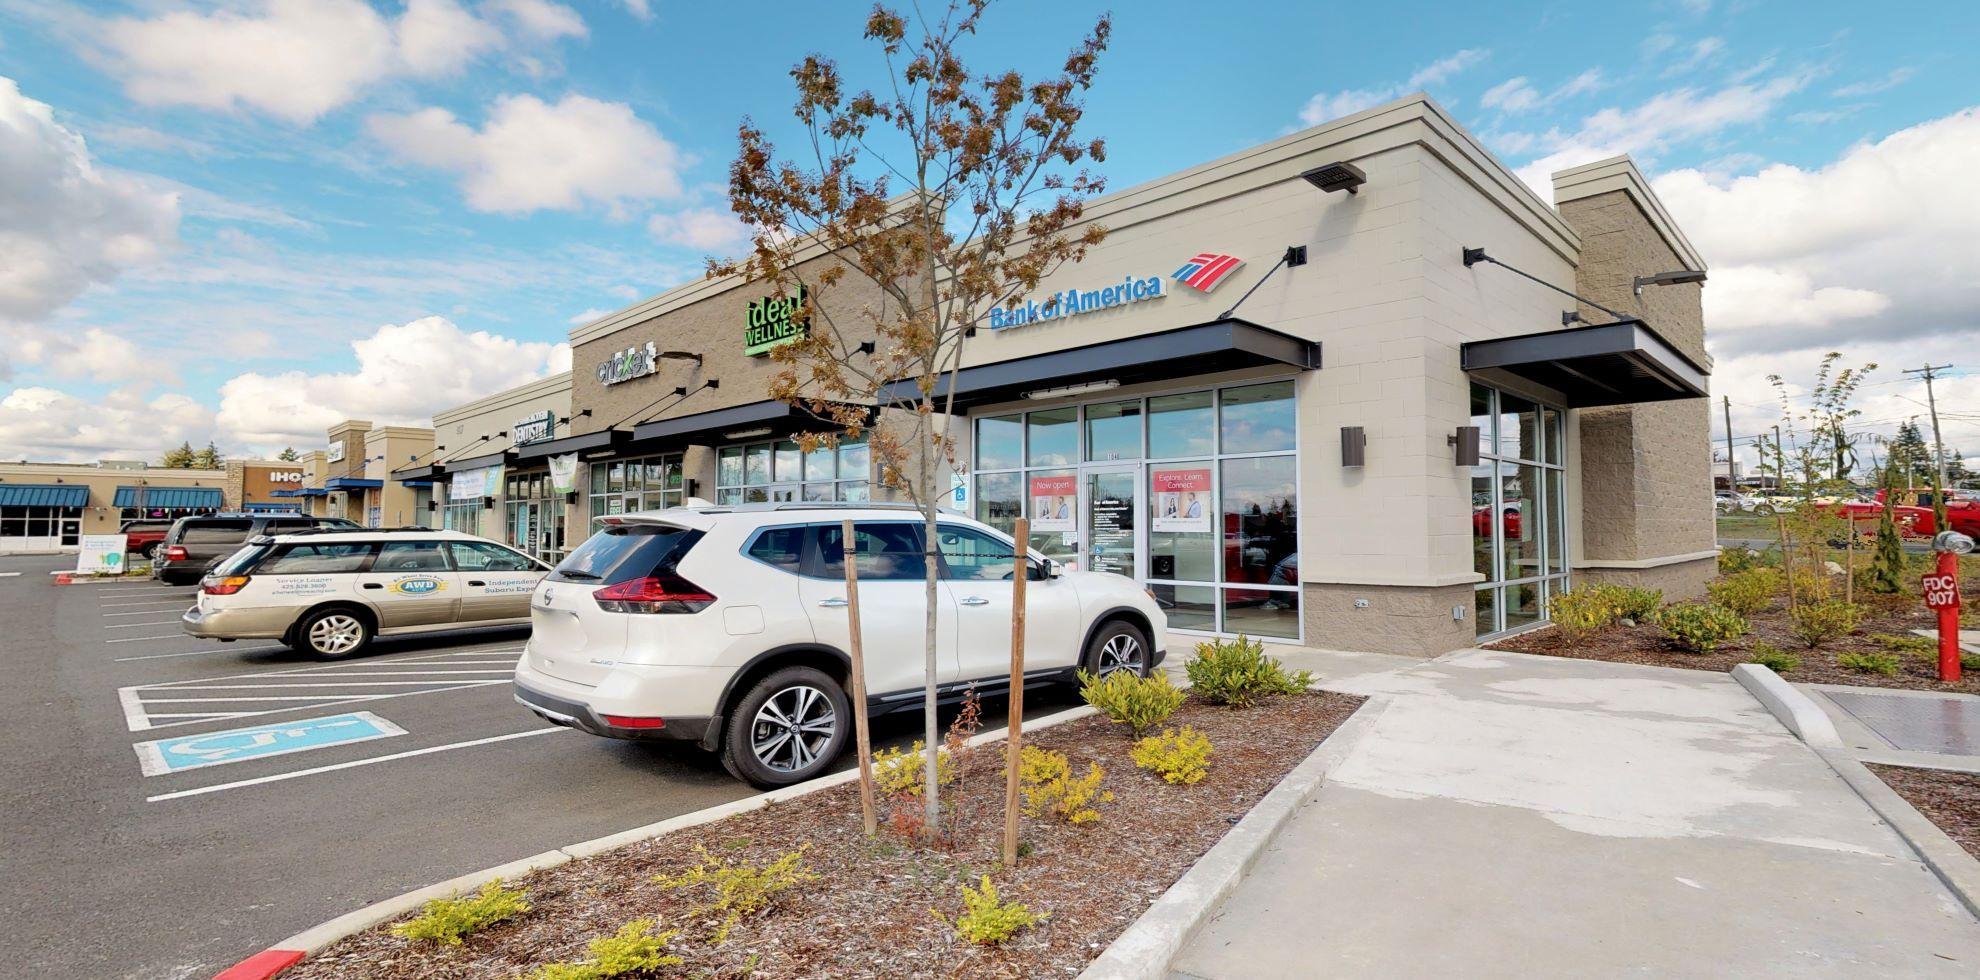 Bank of America Advanced Center with walk-up ATM | 907 Frontier Cir E, Lake Stevens, WA 98258